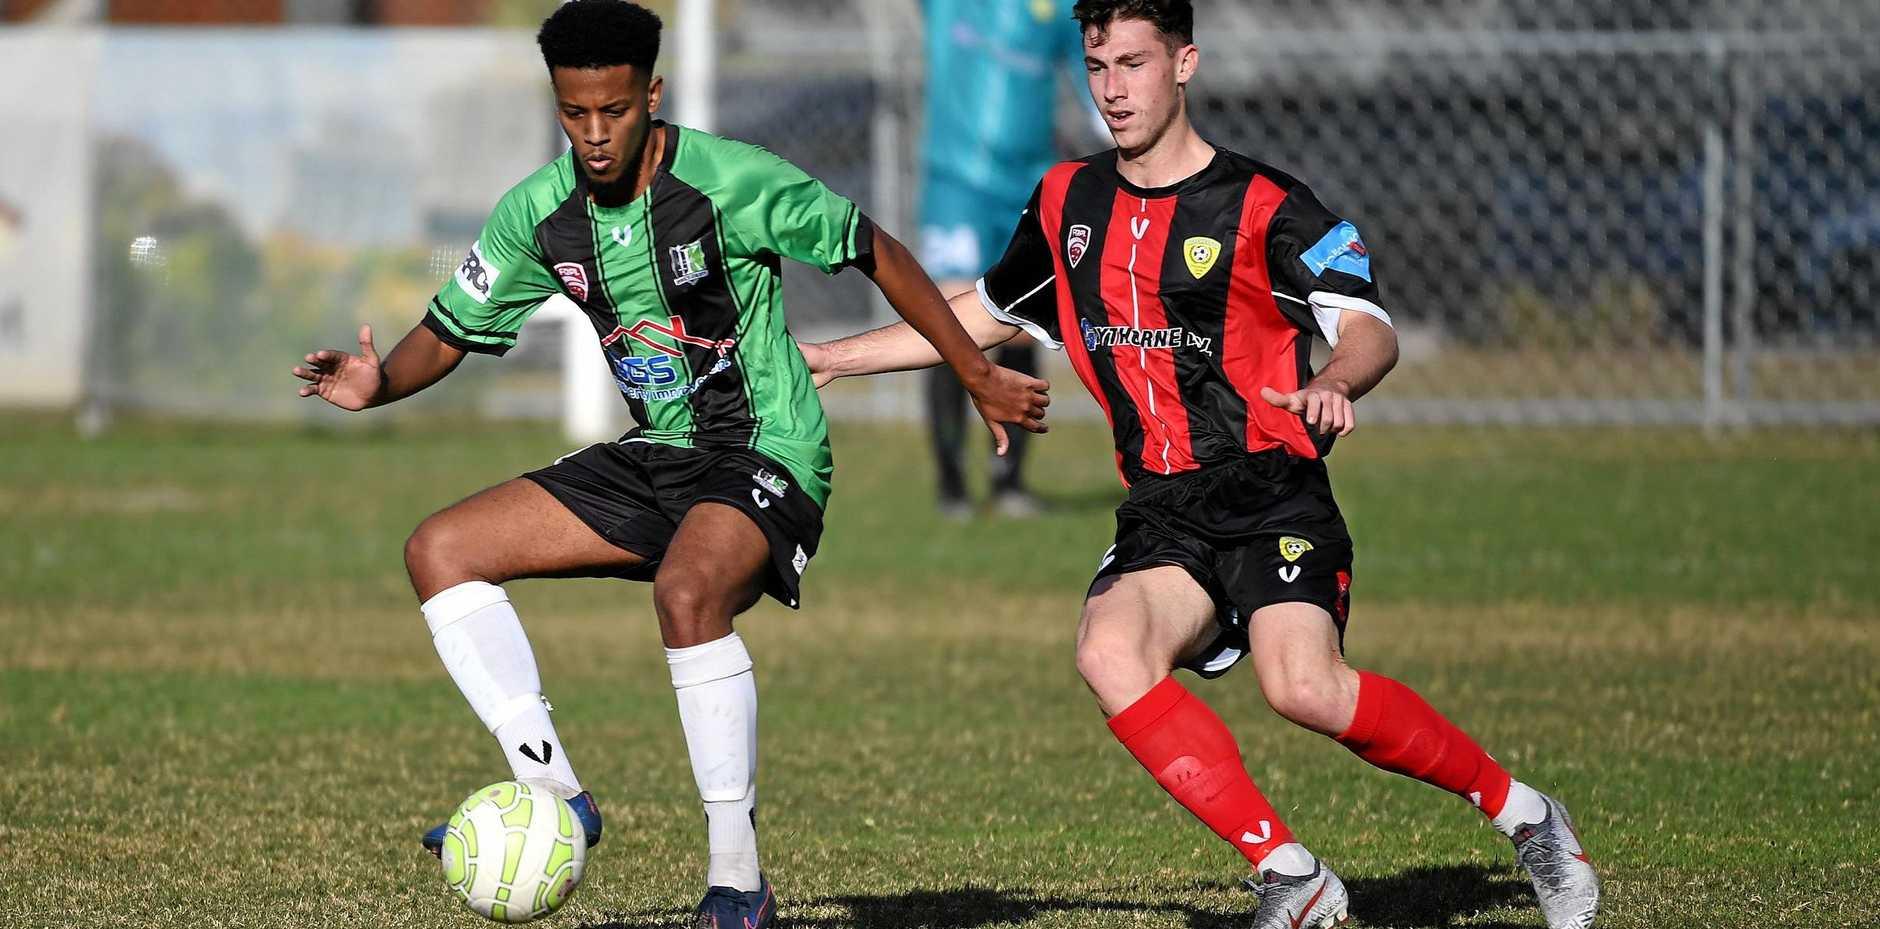 Knights footballer Nahom Woldu retains possession during his team's 1-0 loss to Mitchelton at Bundamba.